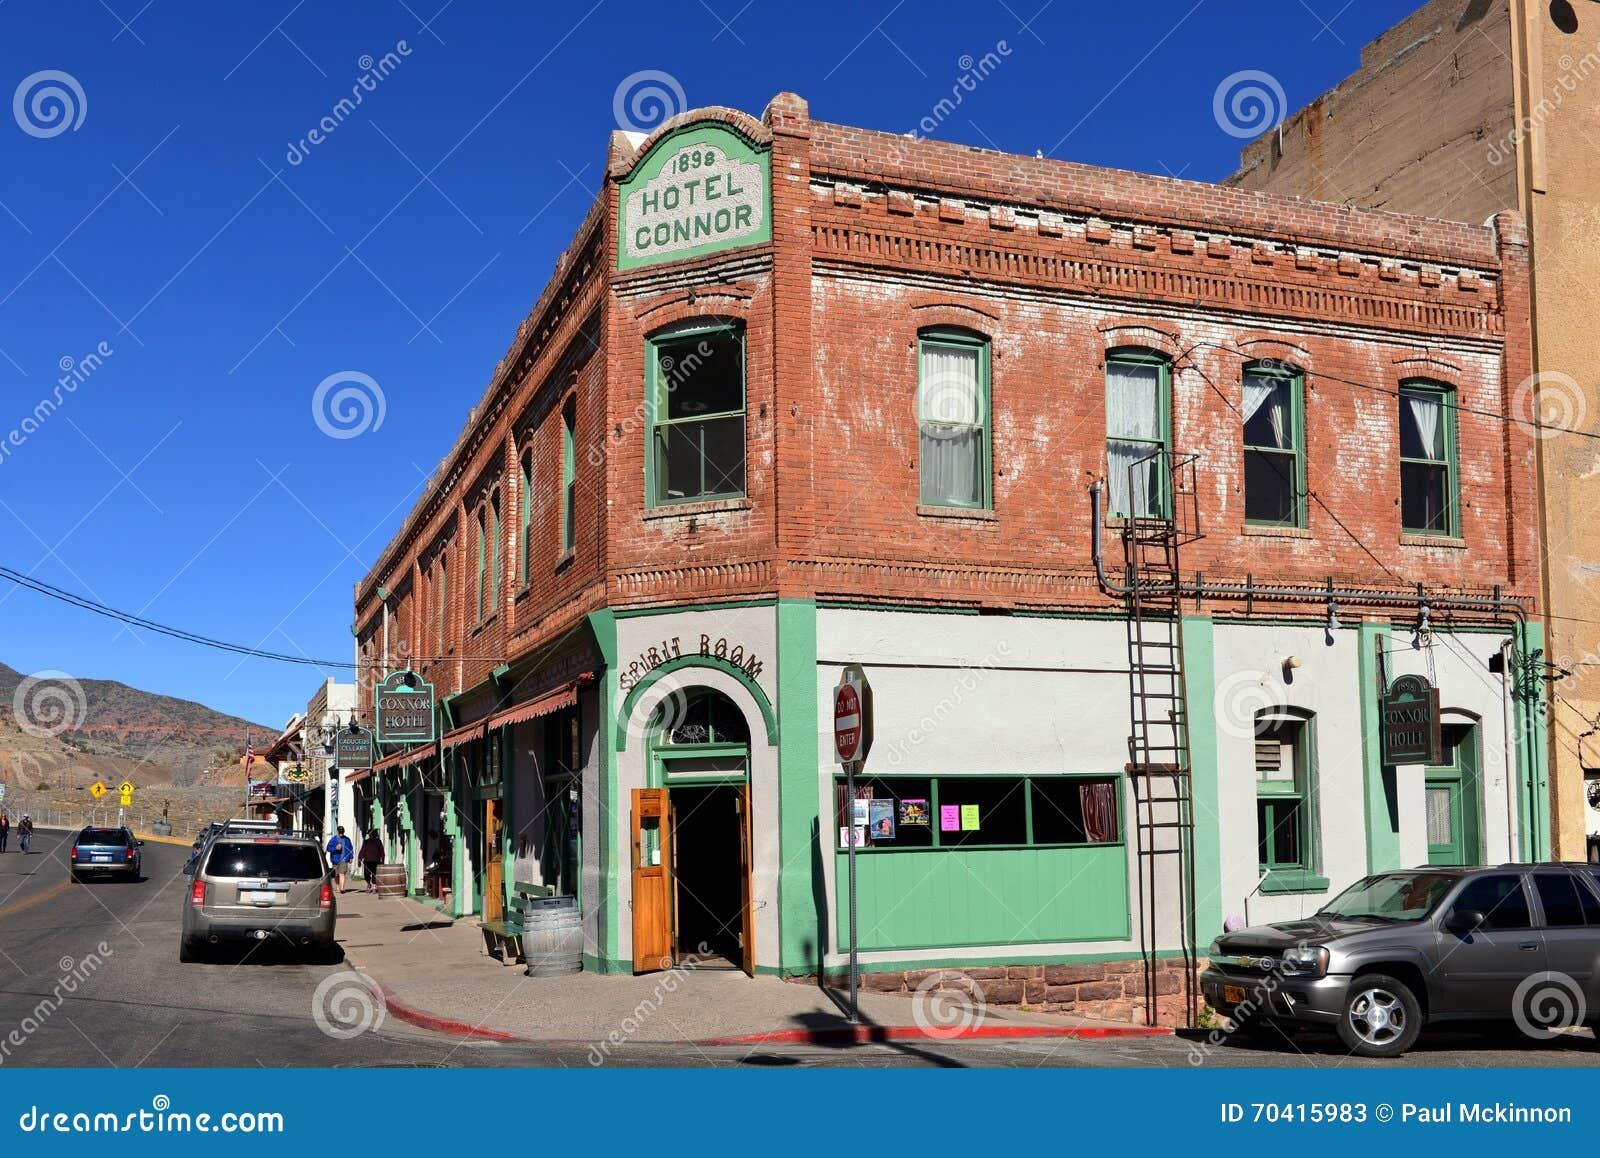 File:Main Street (Jerome, Arizona).jpg - Wikimedia Commons